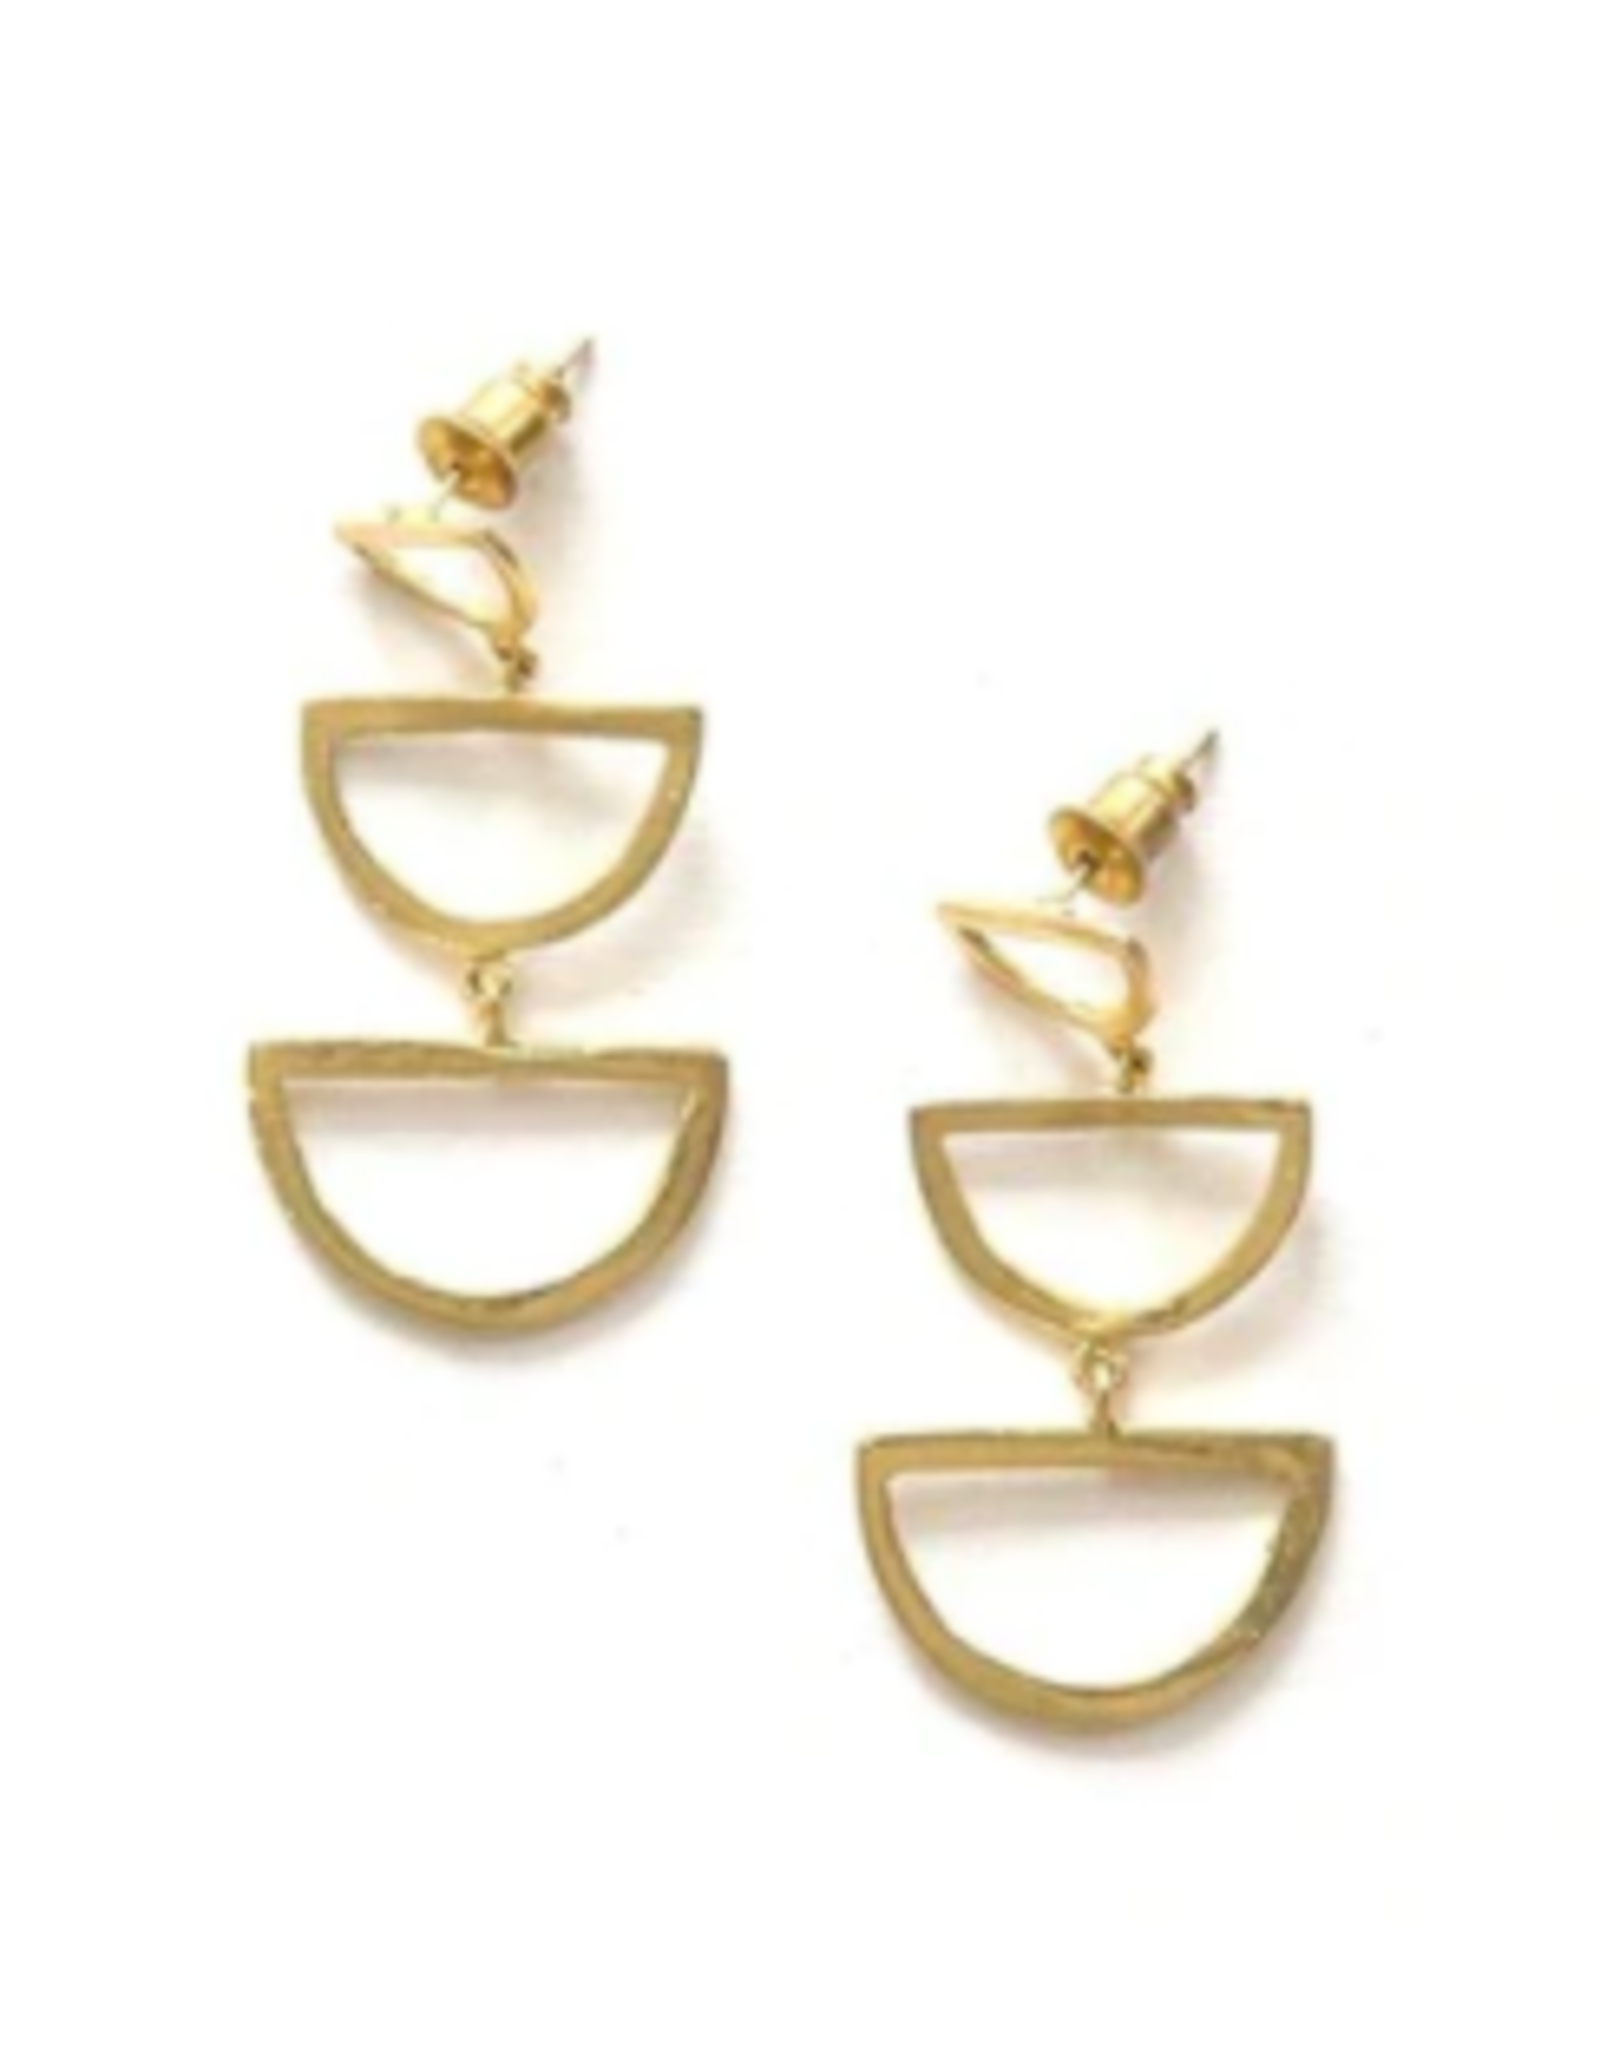 Reverberation Stud Earrings, Brass, India